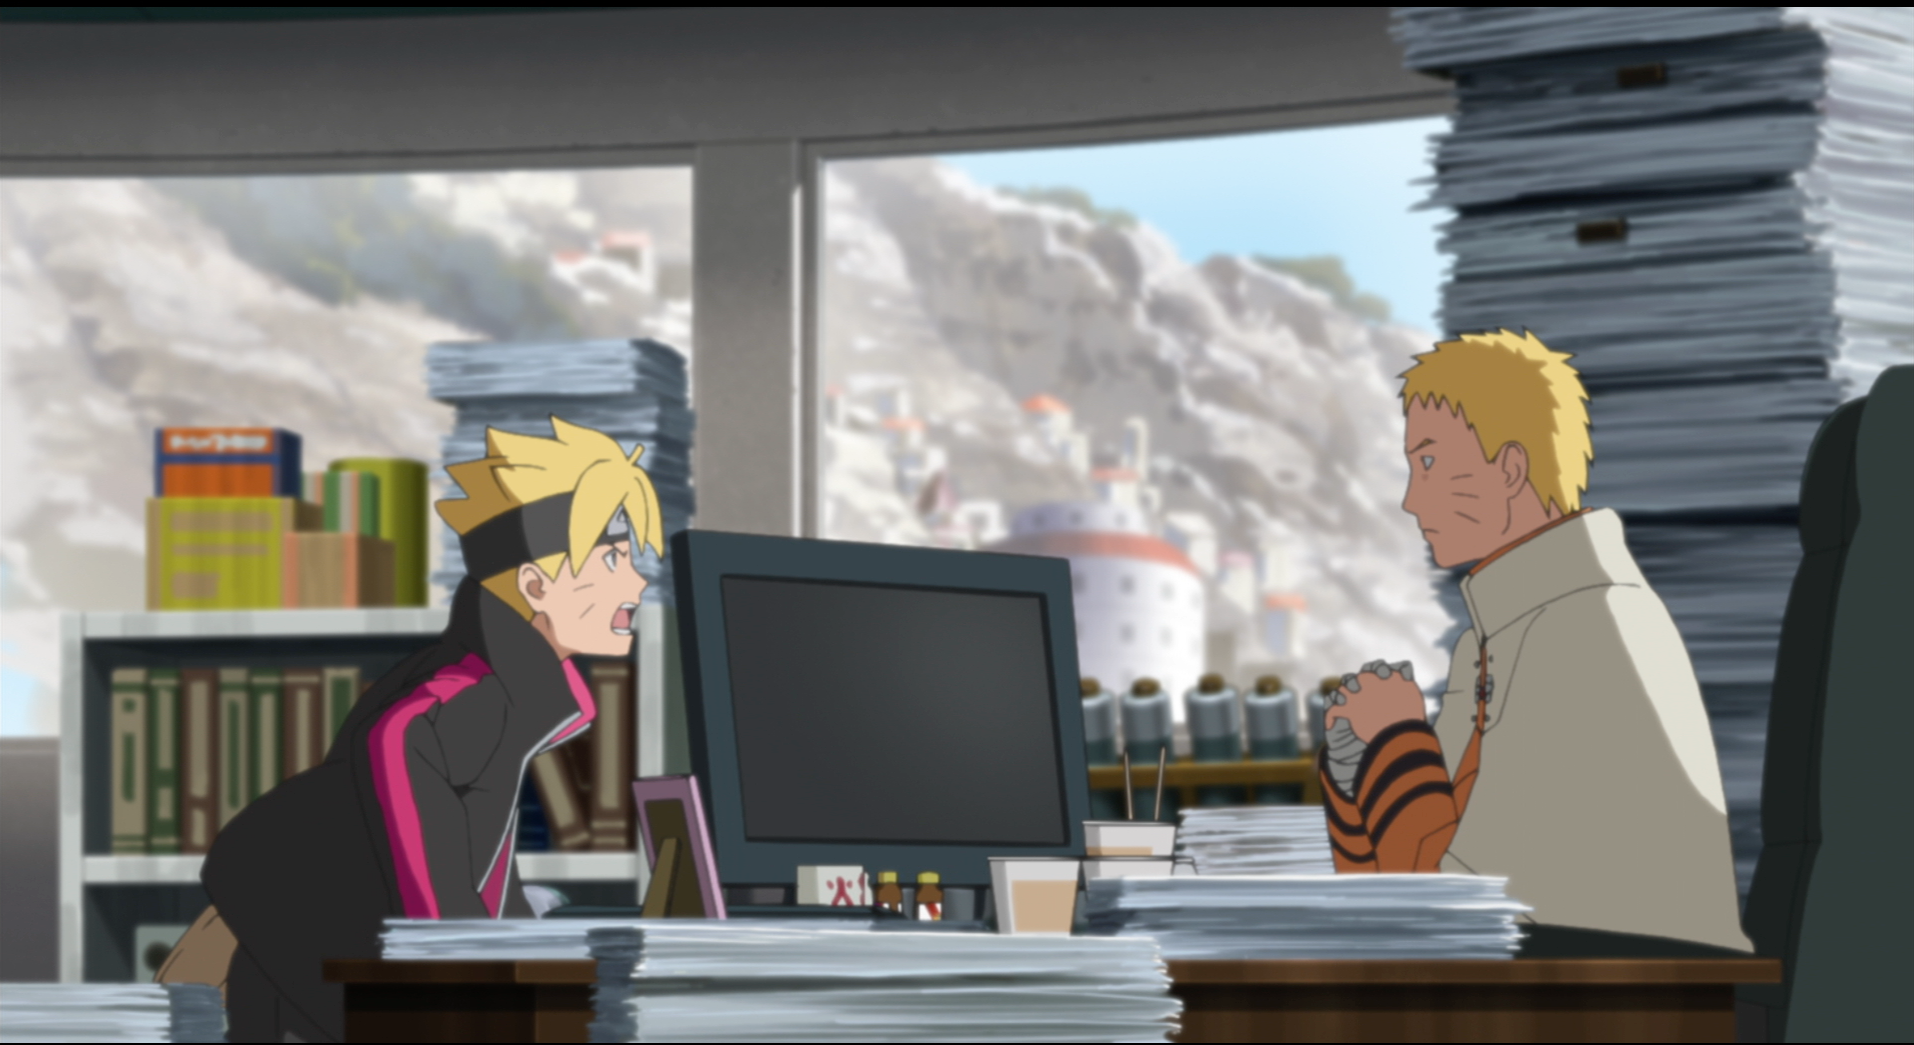 The Anime Legacy Continues with 'Borutu: The Naruto Movie'